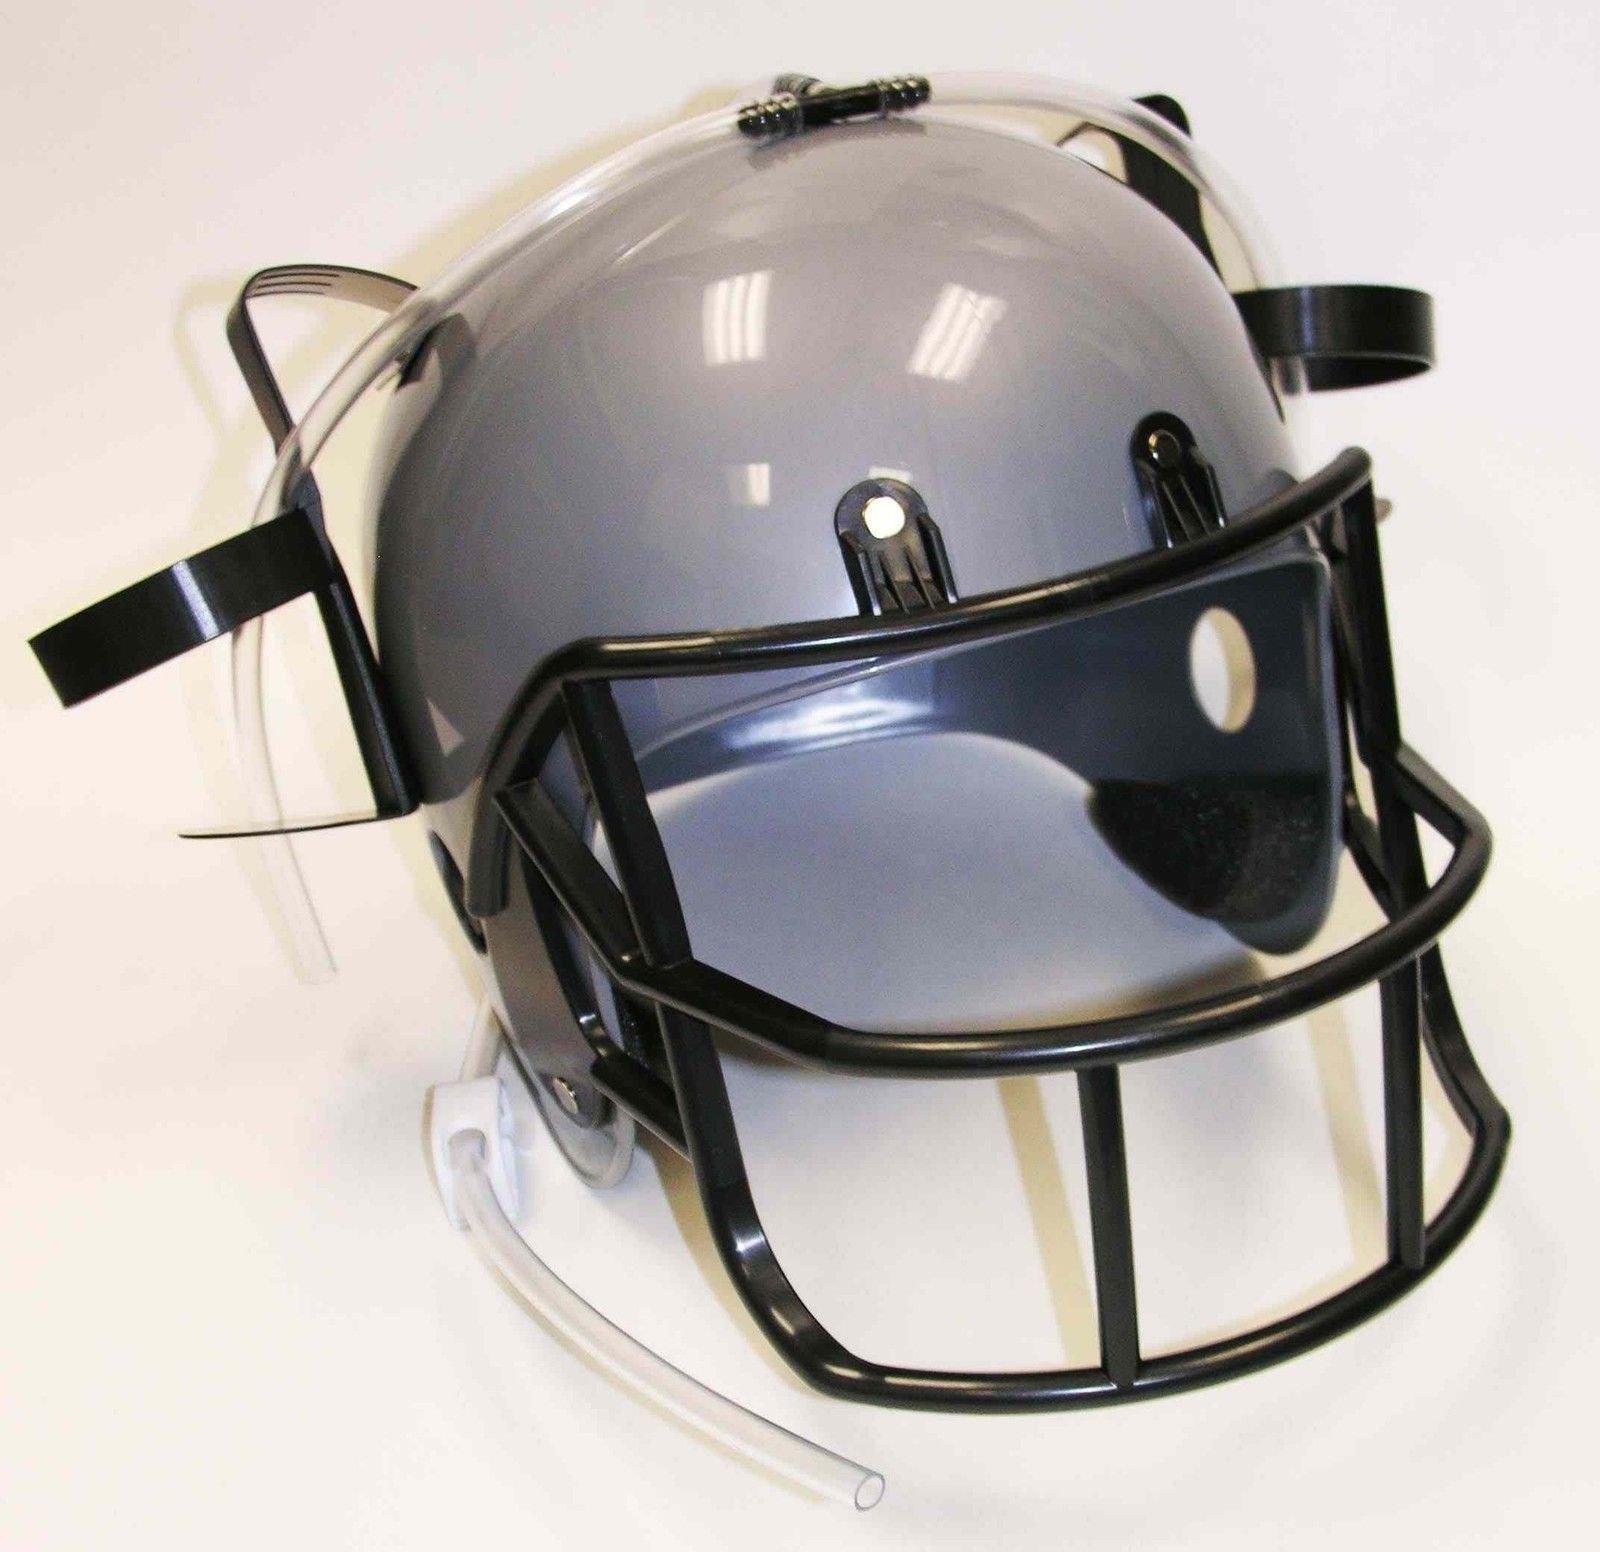 Football Drinking Helmet - Silver Novelty Item by Forum Novelties (Image #3)